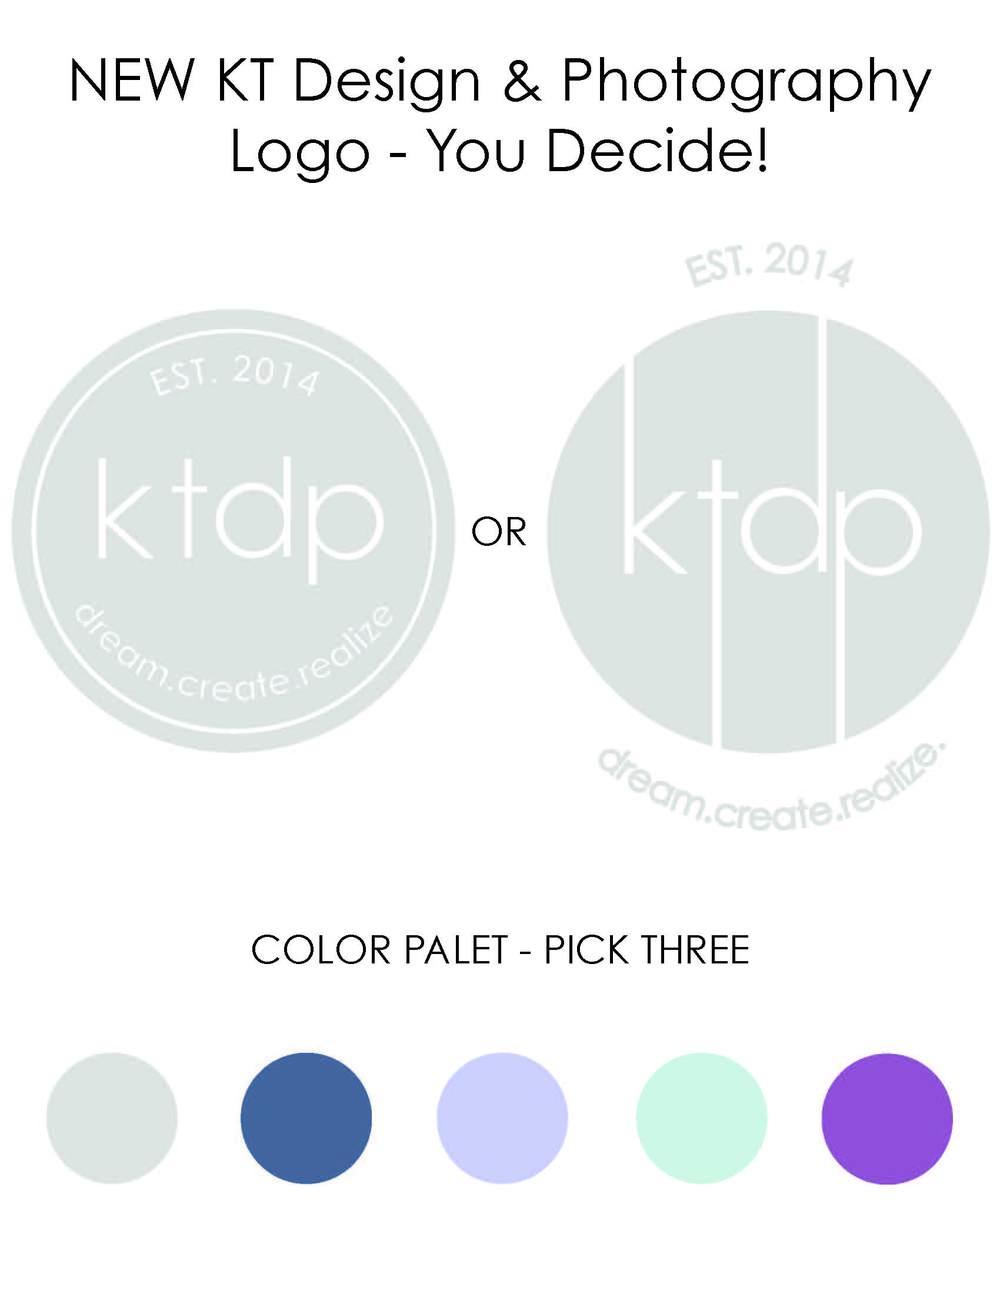 KT Design & Photography Ideas.jpg